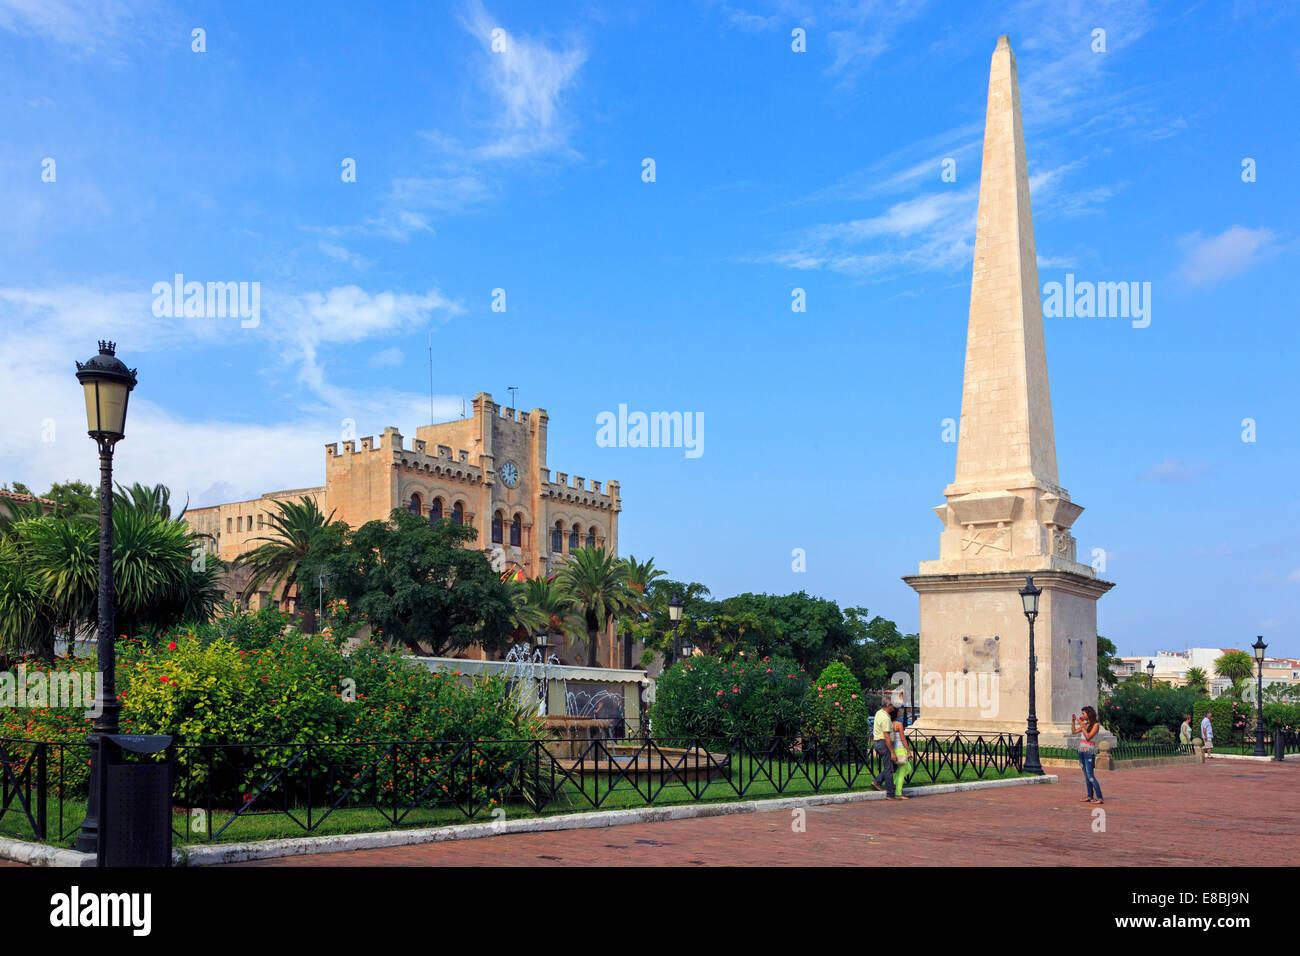 Placa des Born with the Adjuntament de Ciutadella in the middle, Ciutadella, Menorca, Spain - Stock Image